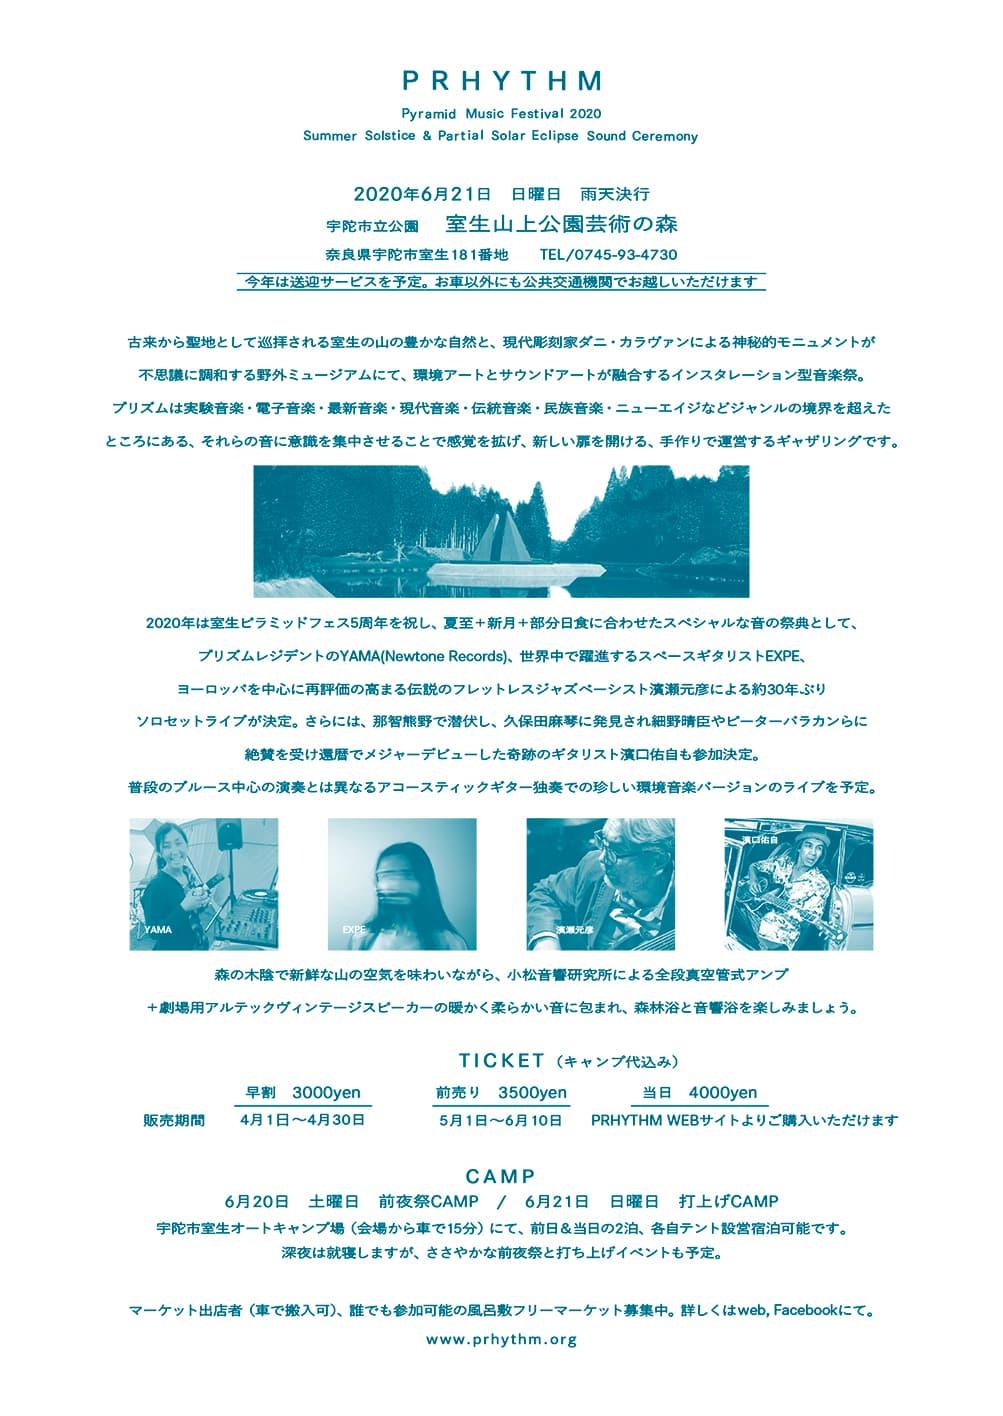 PRHYTHM Pyramid Music Festival 2020 Summer Solstice & Partial Solar Eclipse Sound Ceremony